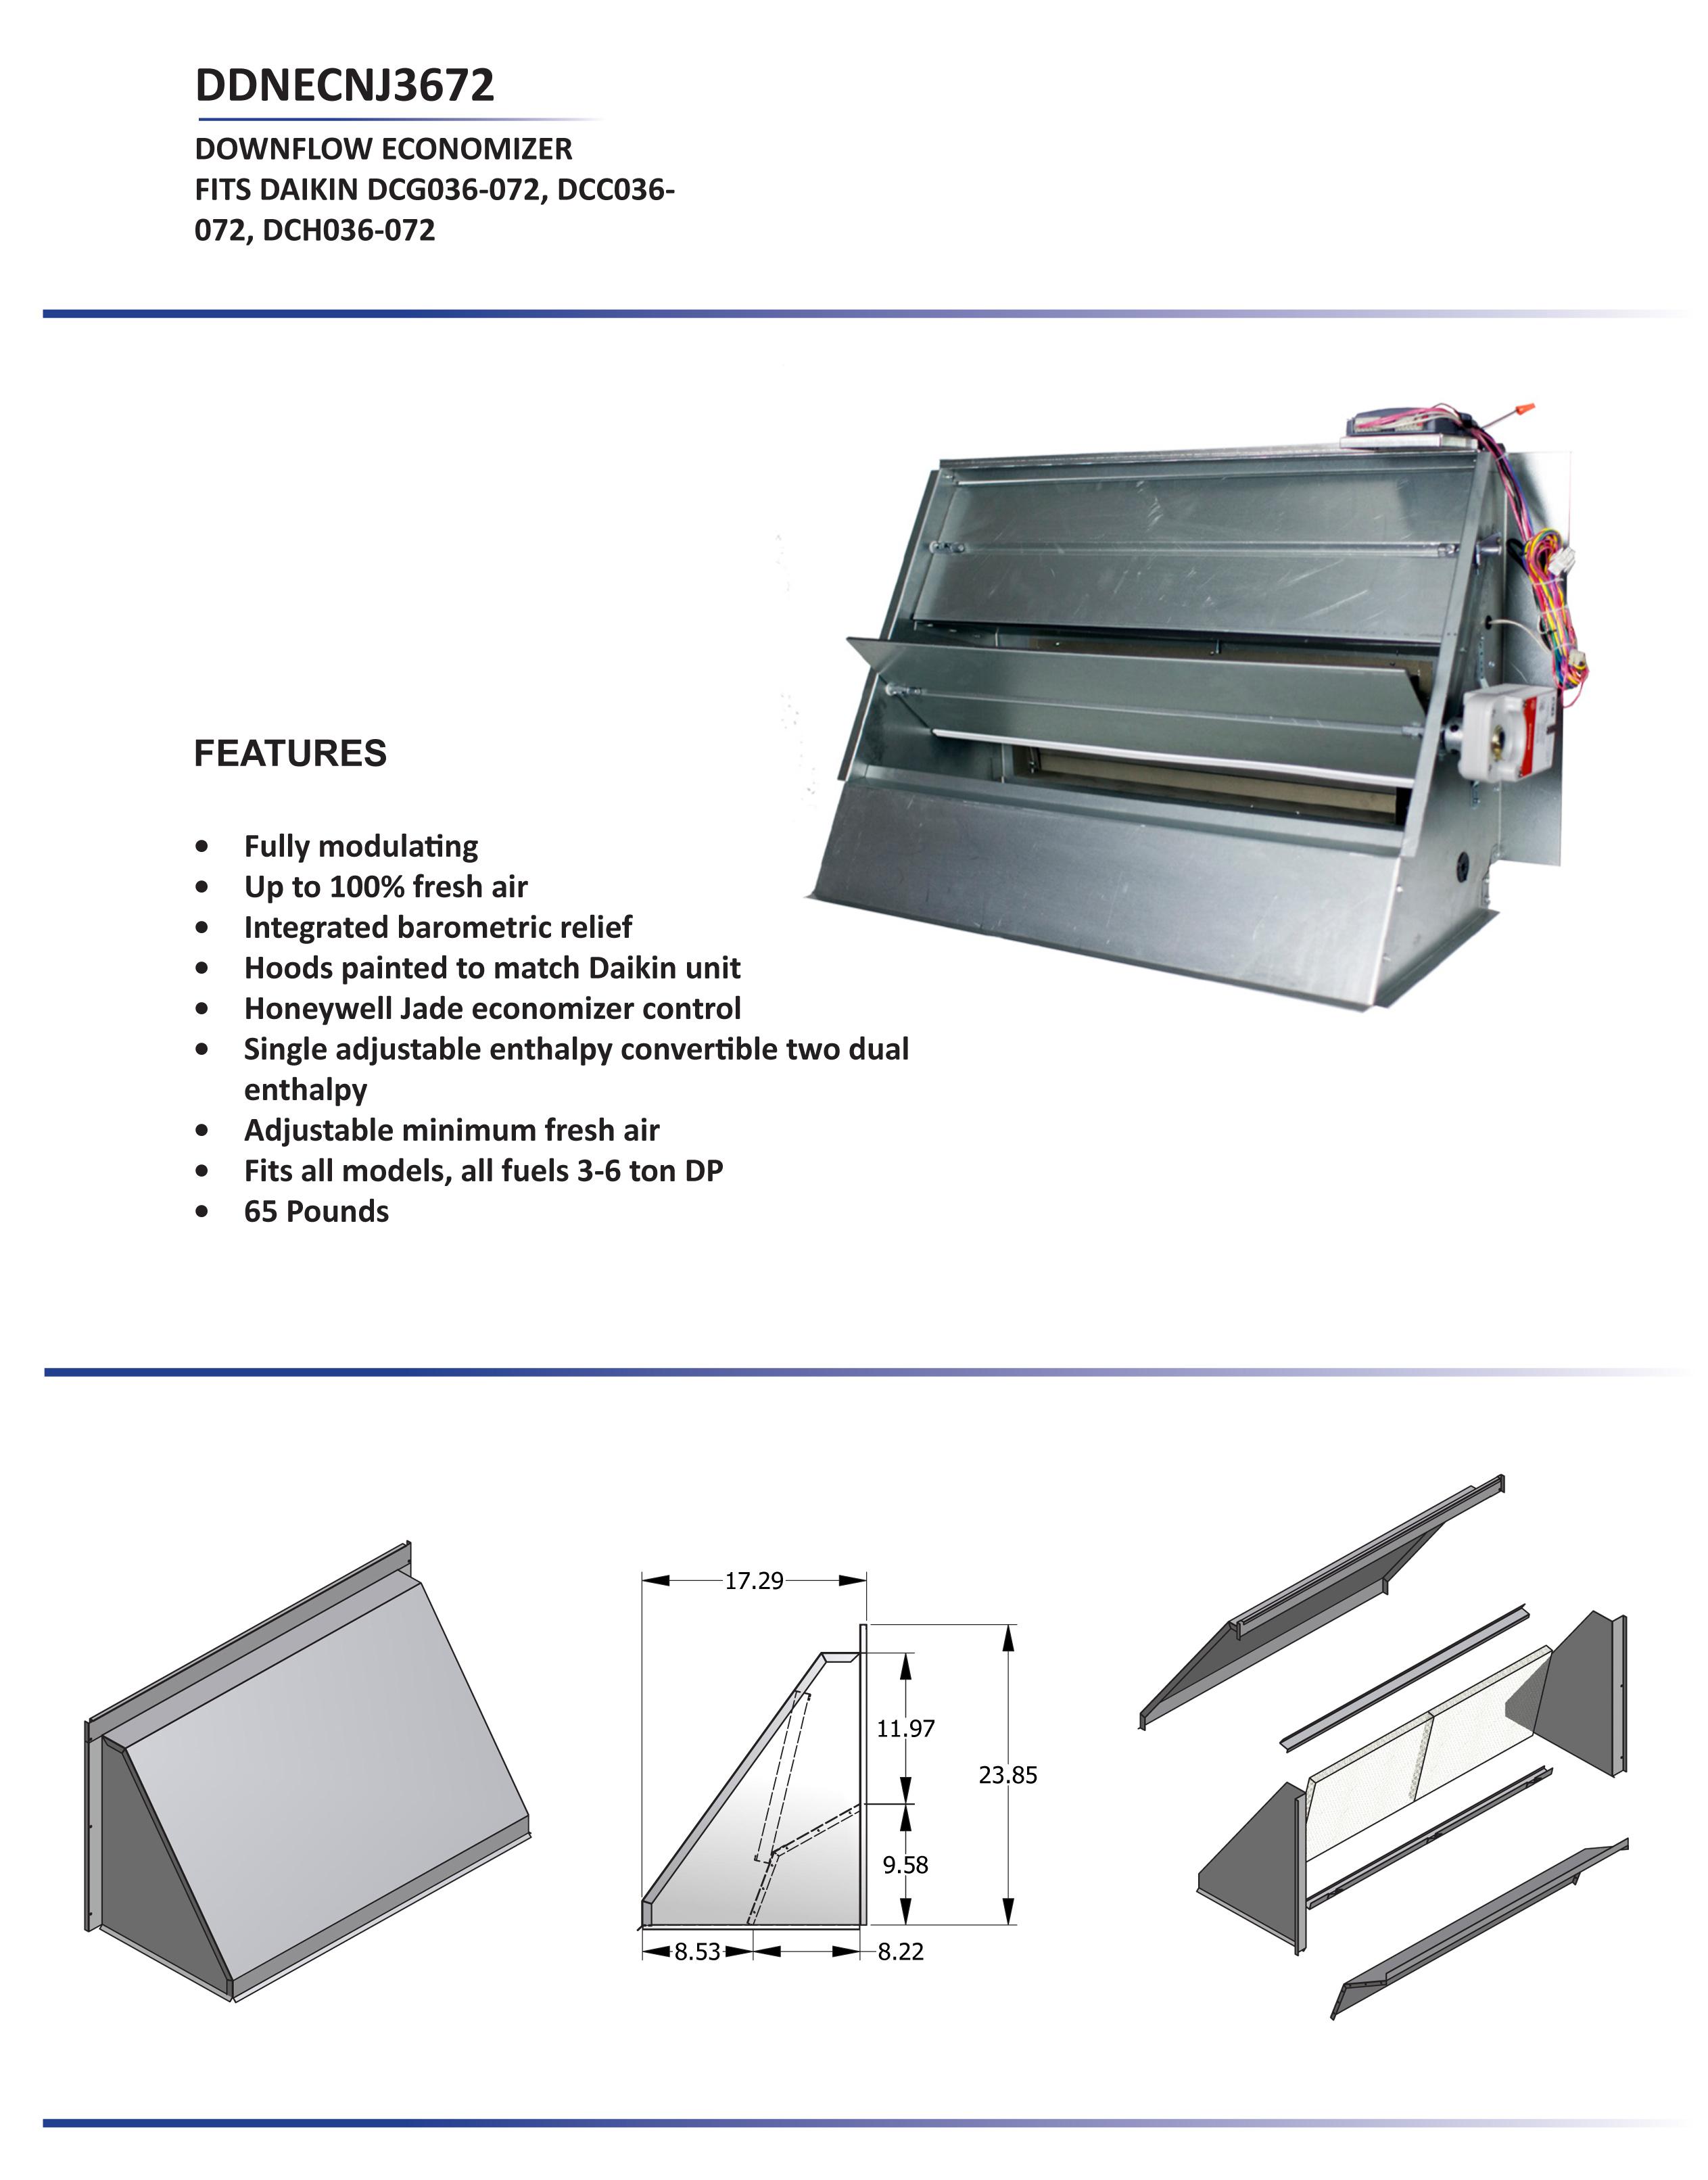 3 6 ton daikin downflow economizer dcc dcg dch models ddnecnj3672 rh budgetheating com Goodman Air Conditioner Wiring Diagram Residential Electrical Wiring Diagrams